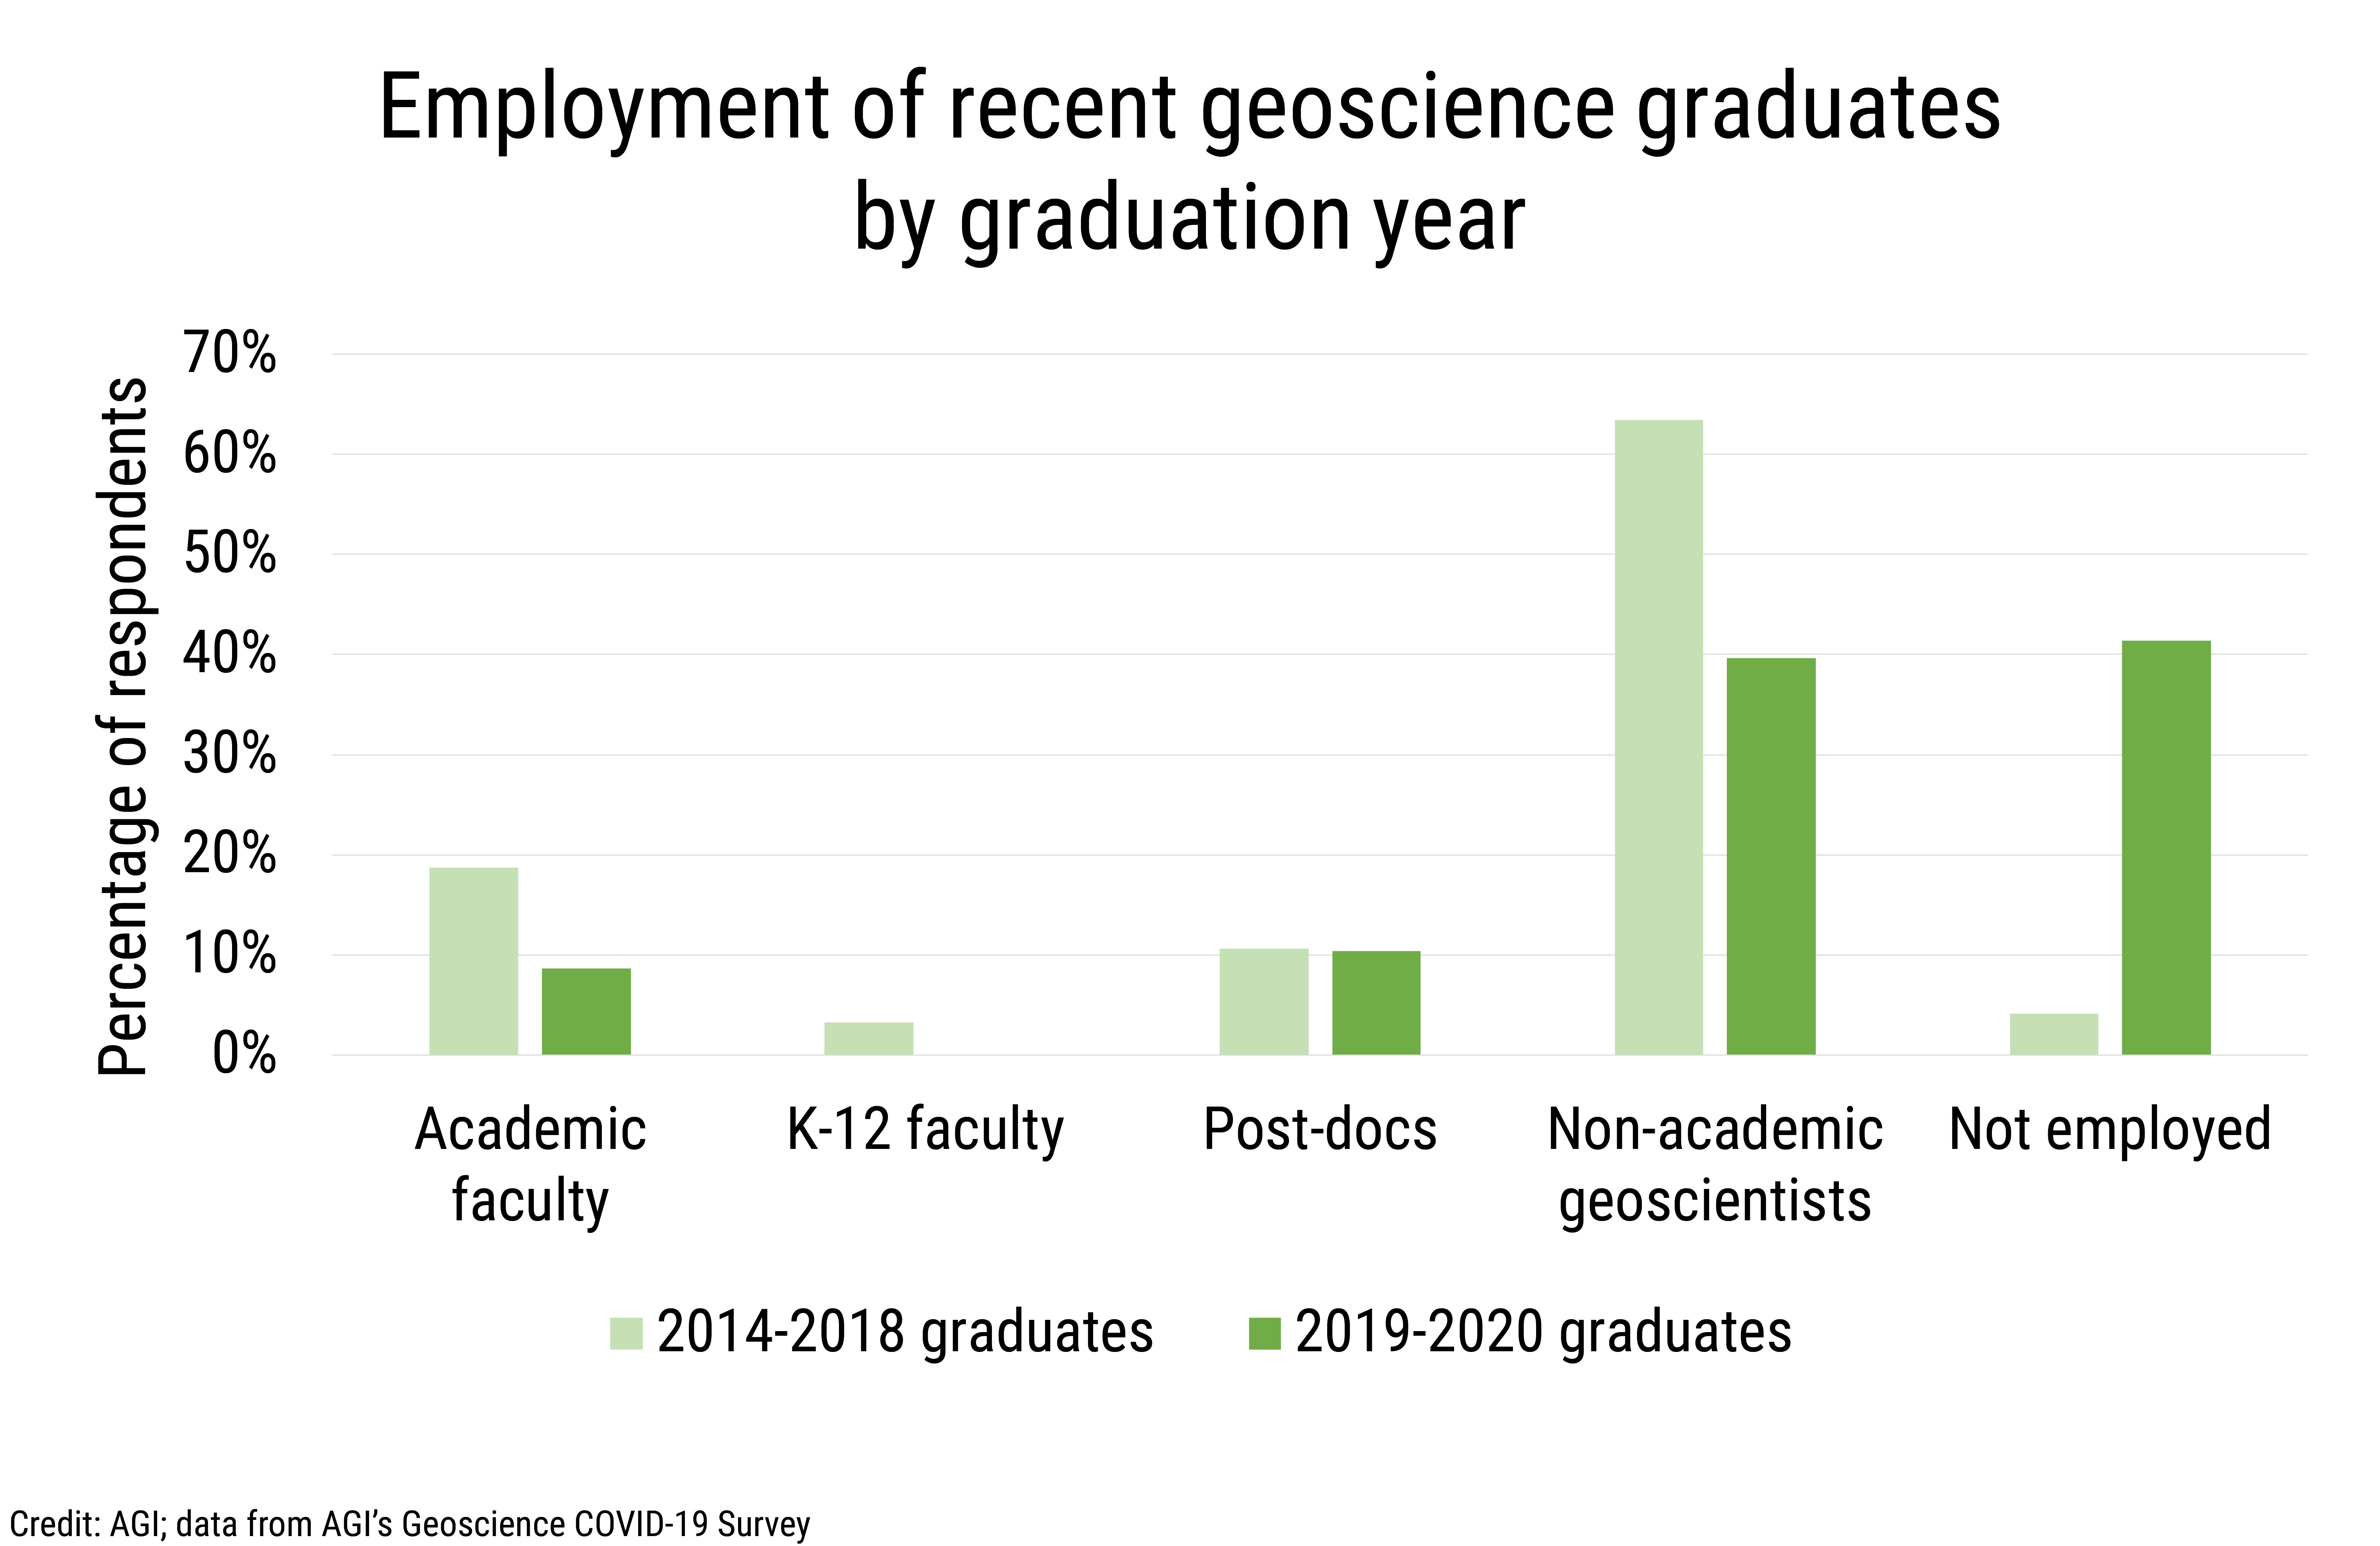 Data Brief 2020-010 chart 01: Employment of recent geoscience graduates by graduation year (credit: AGI; data from AGI's Geoscience COVID-19 Survey)